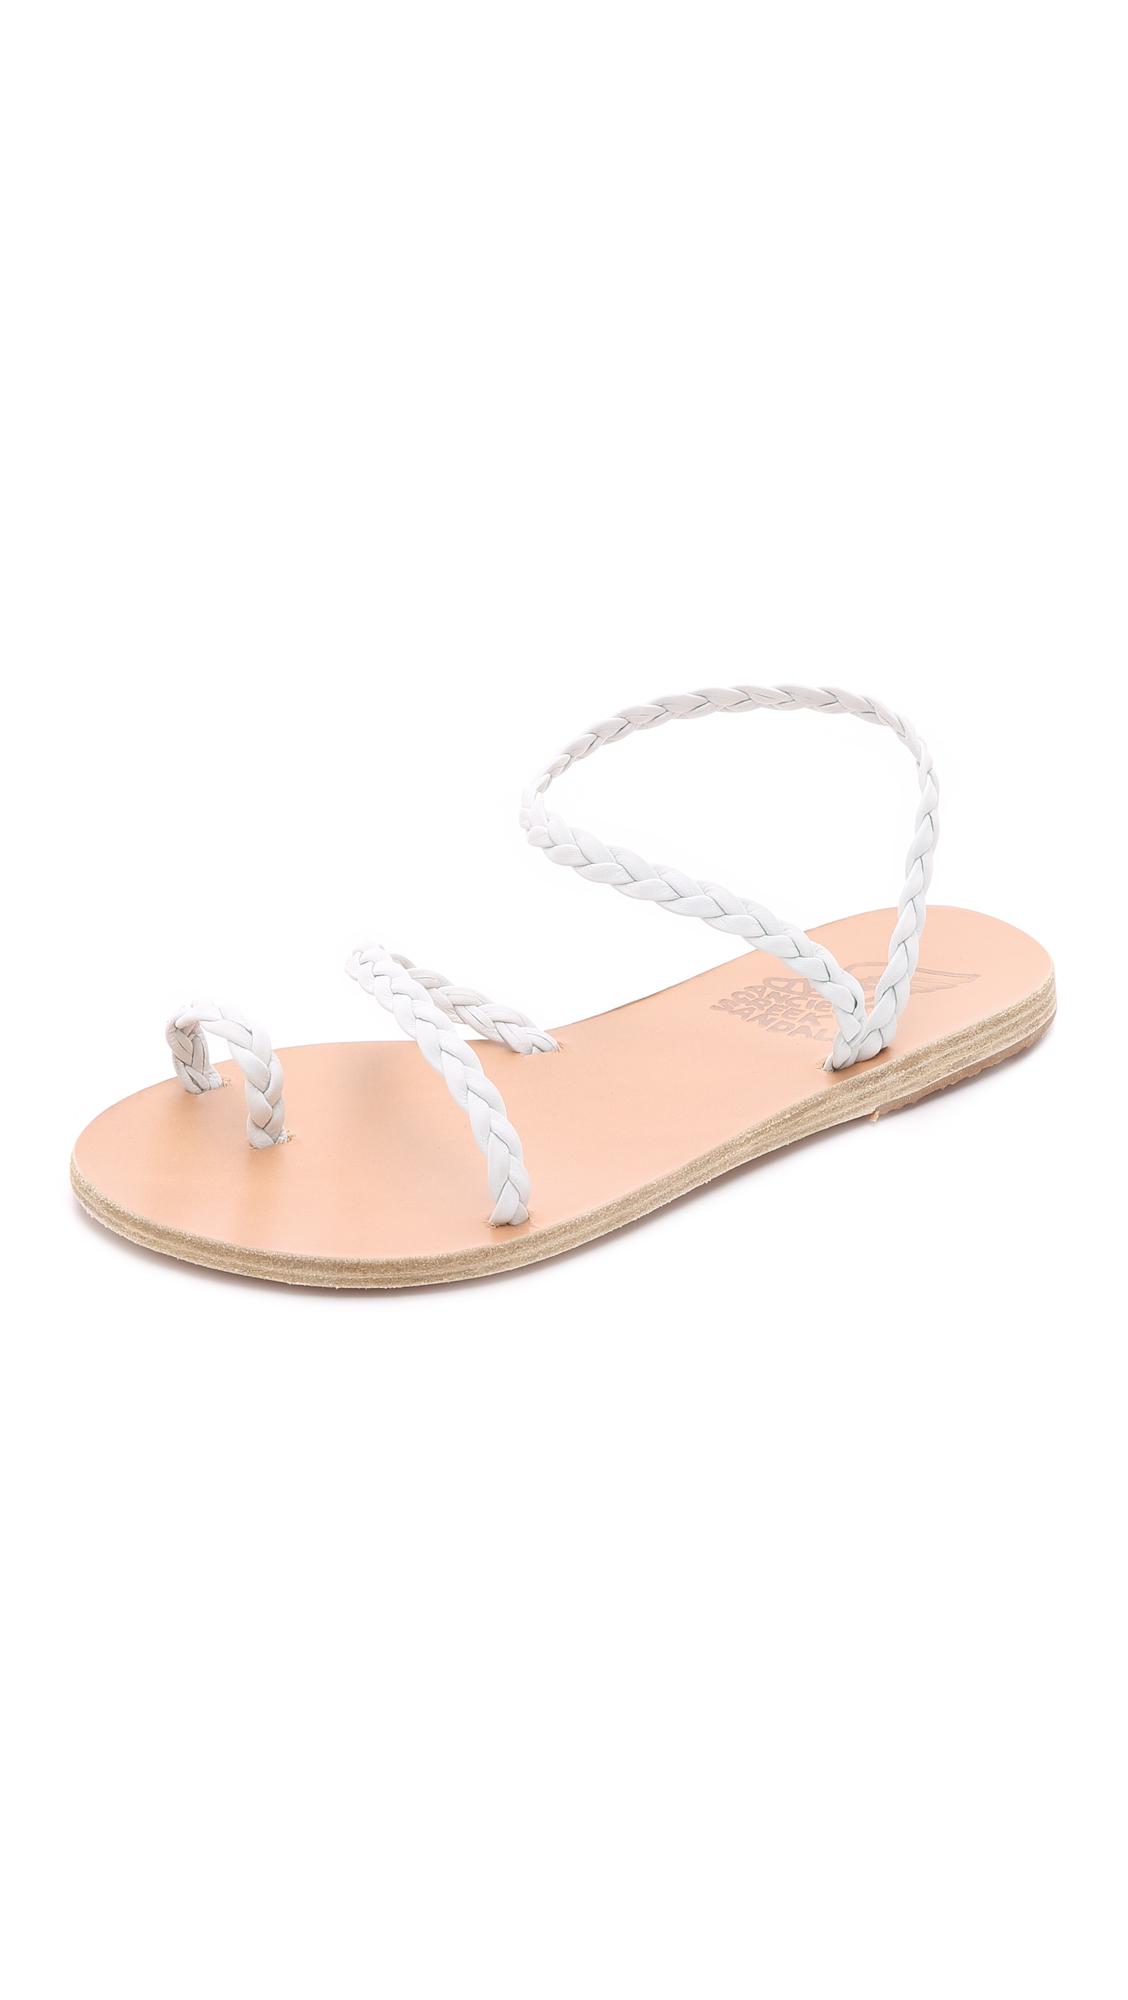 Lyst Ancient Greek Sandals Eleftheria Sandals In White